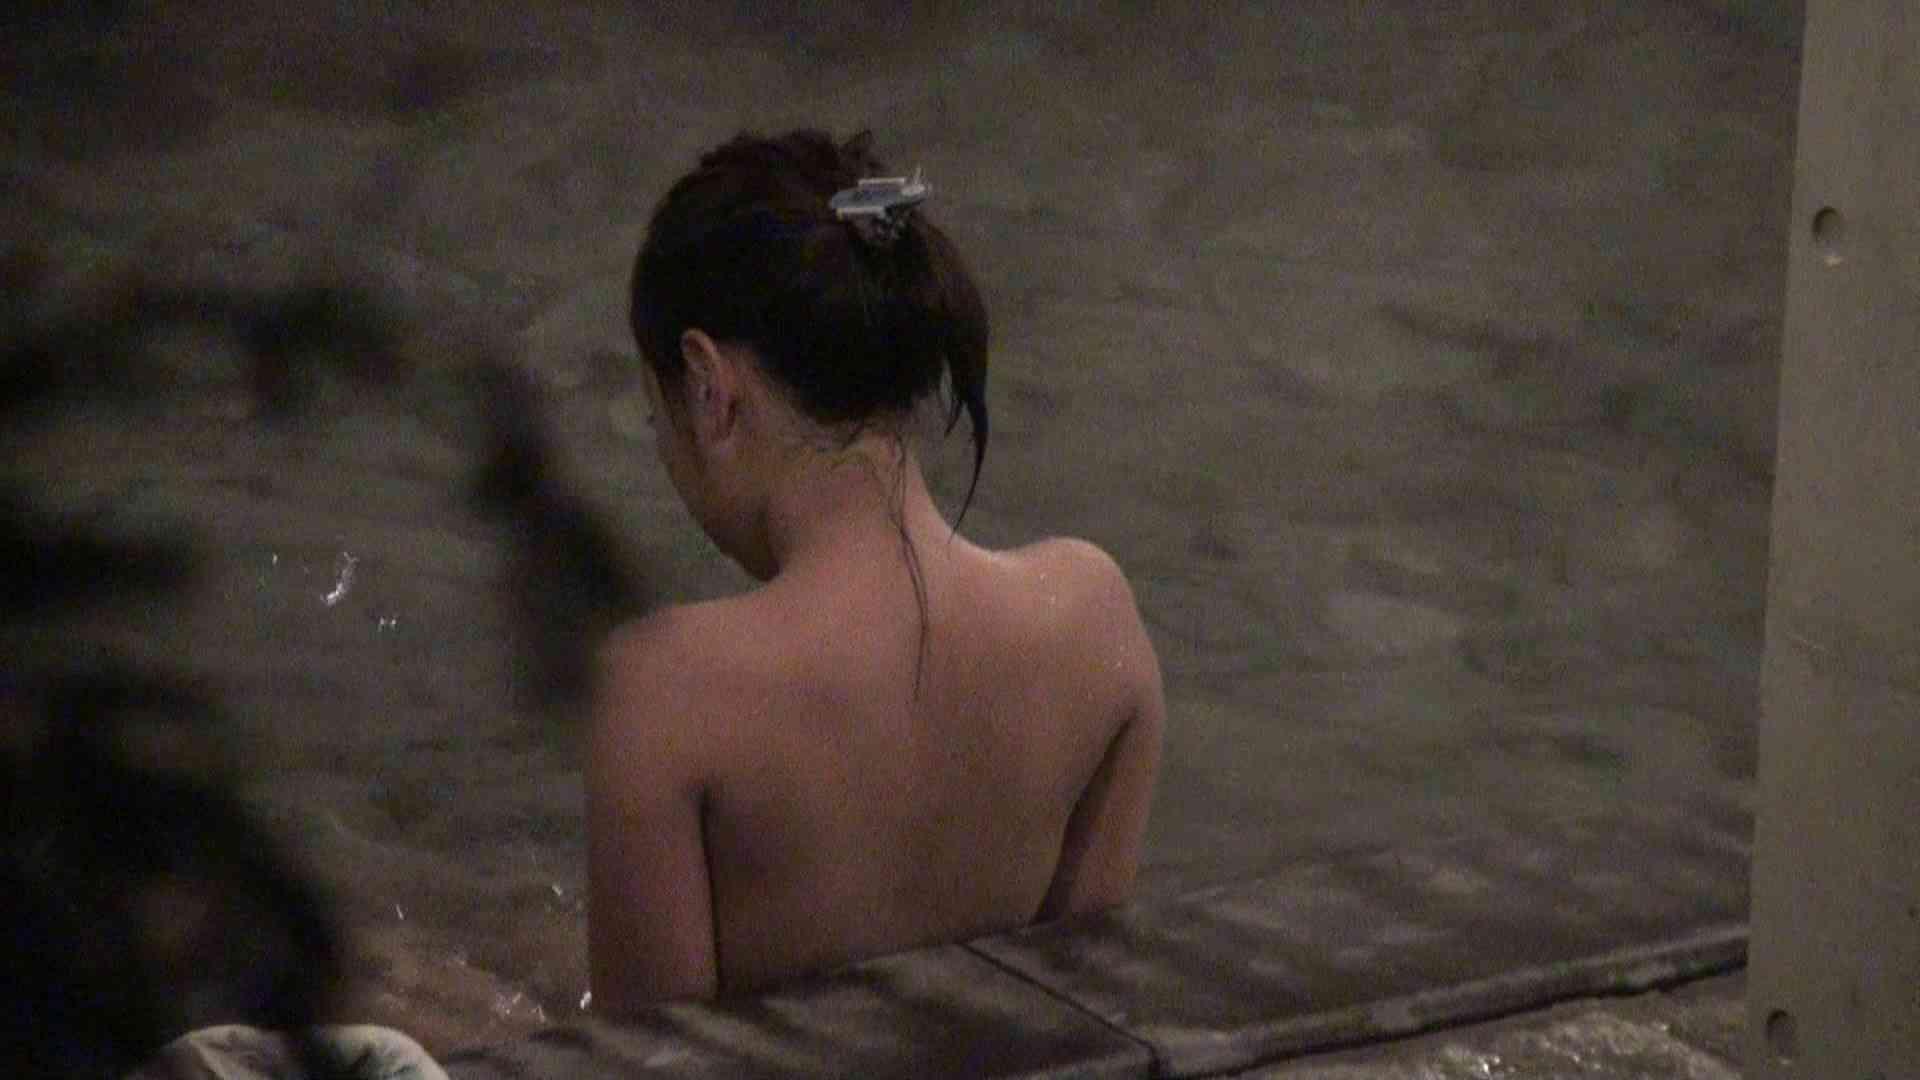 Aquaな露天風呂Vol.407 0   0  67連発 66